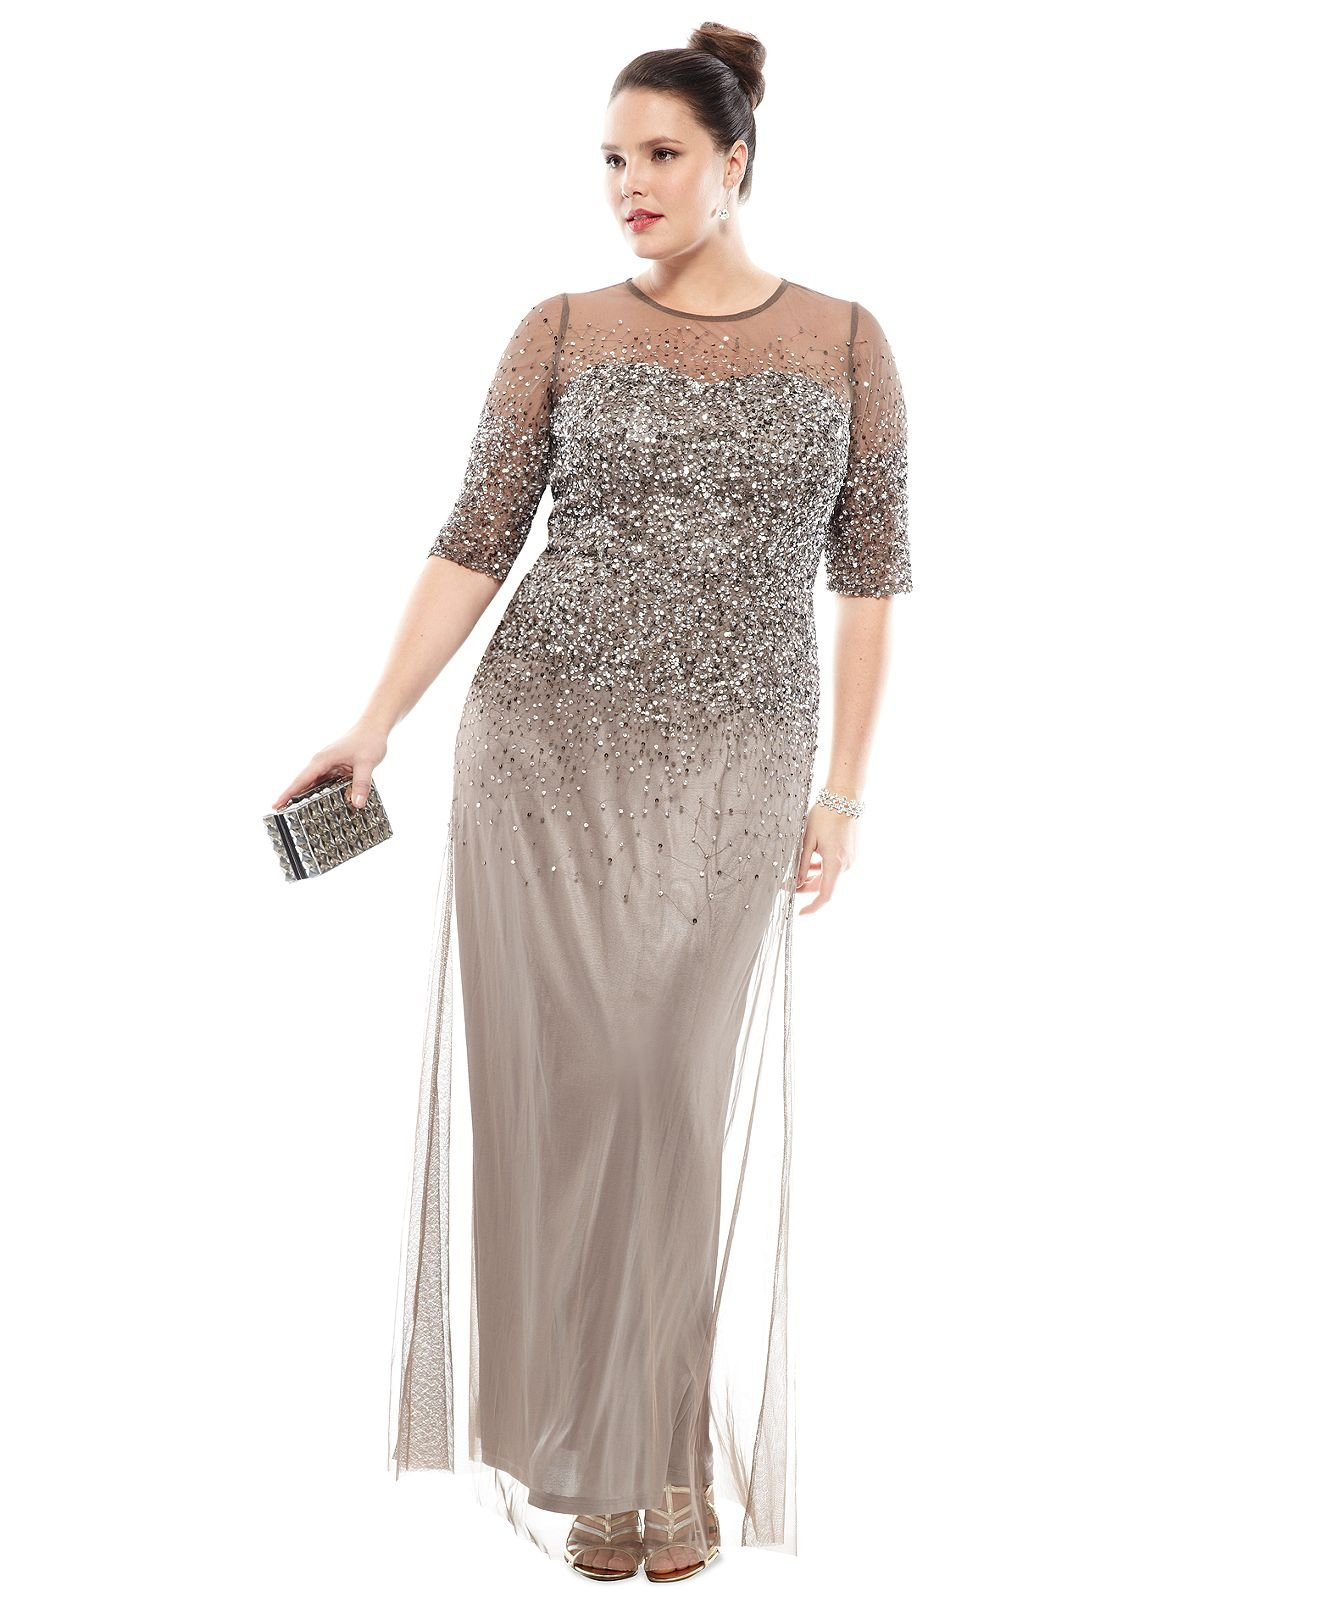 macys plus size formal dresses photo - 1